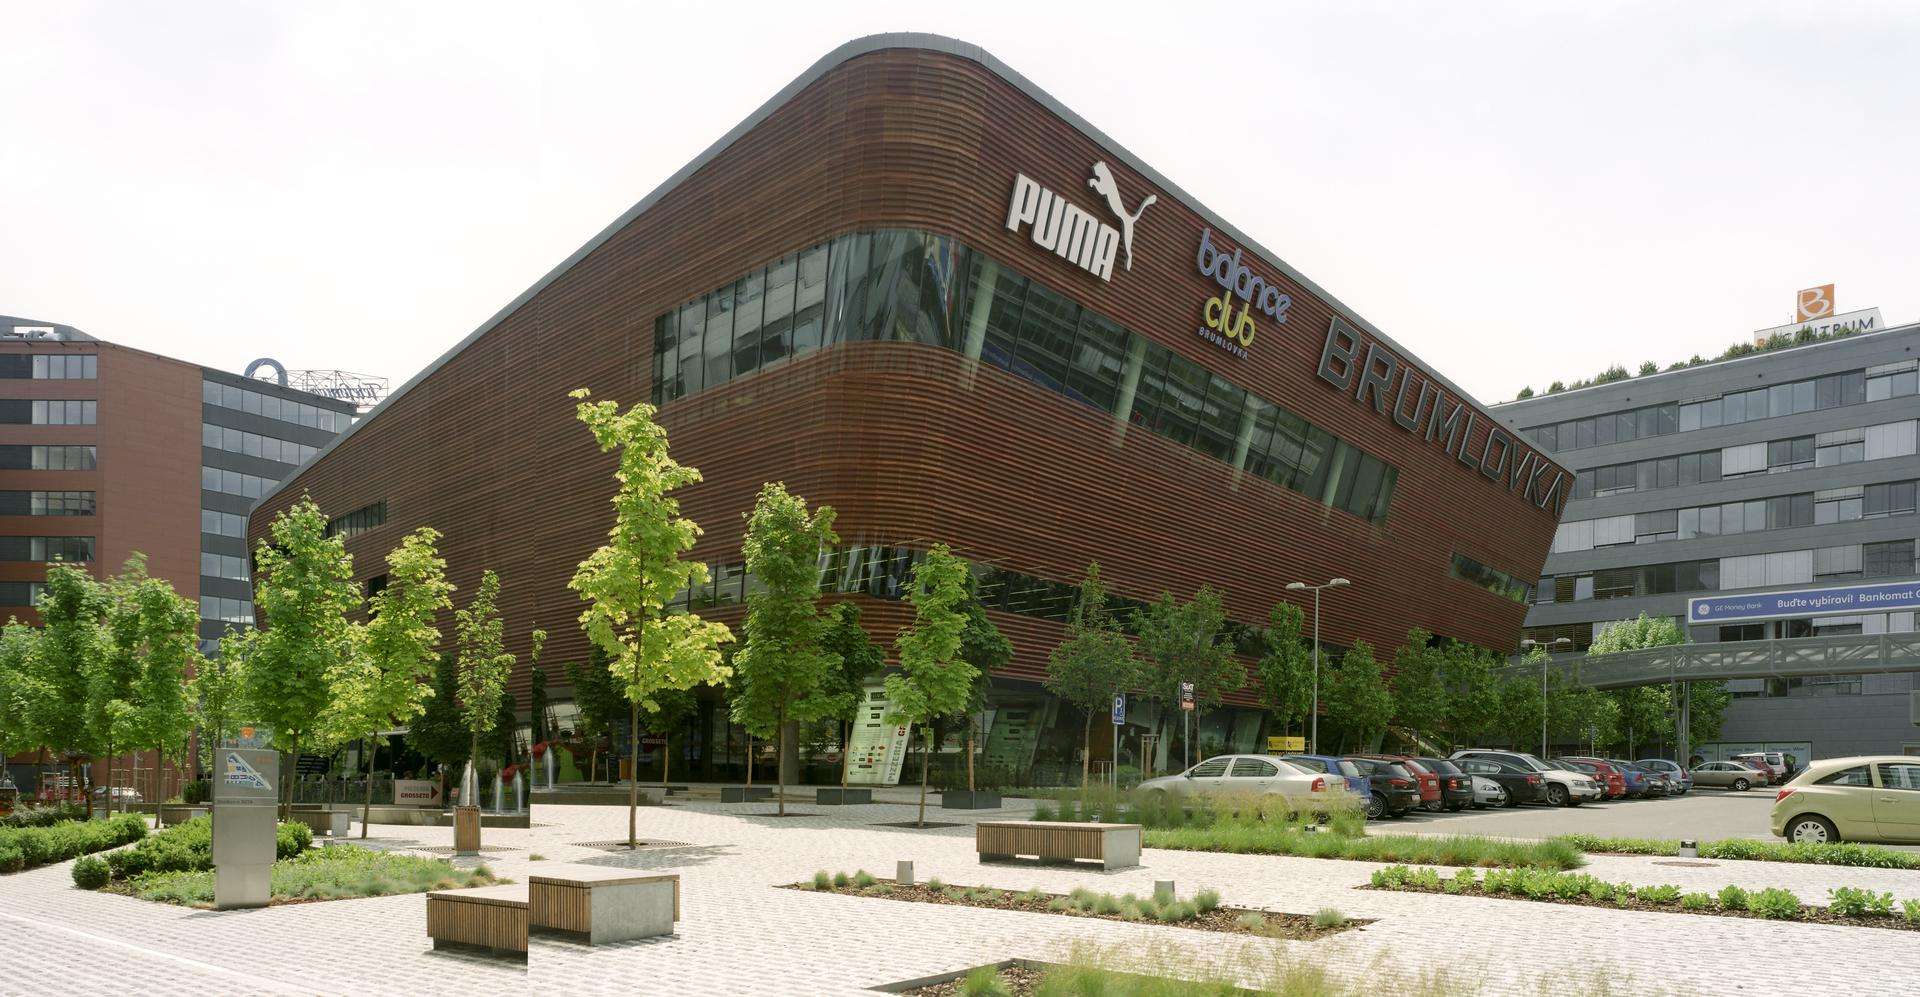 Nova Brumlovka – Leisure center